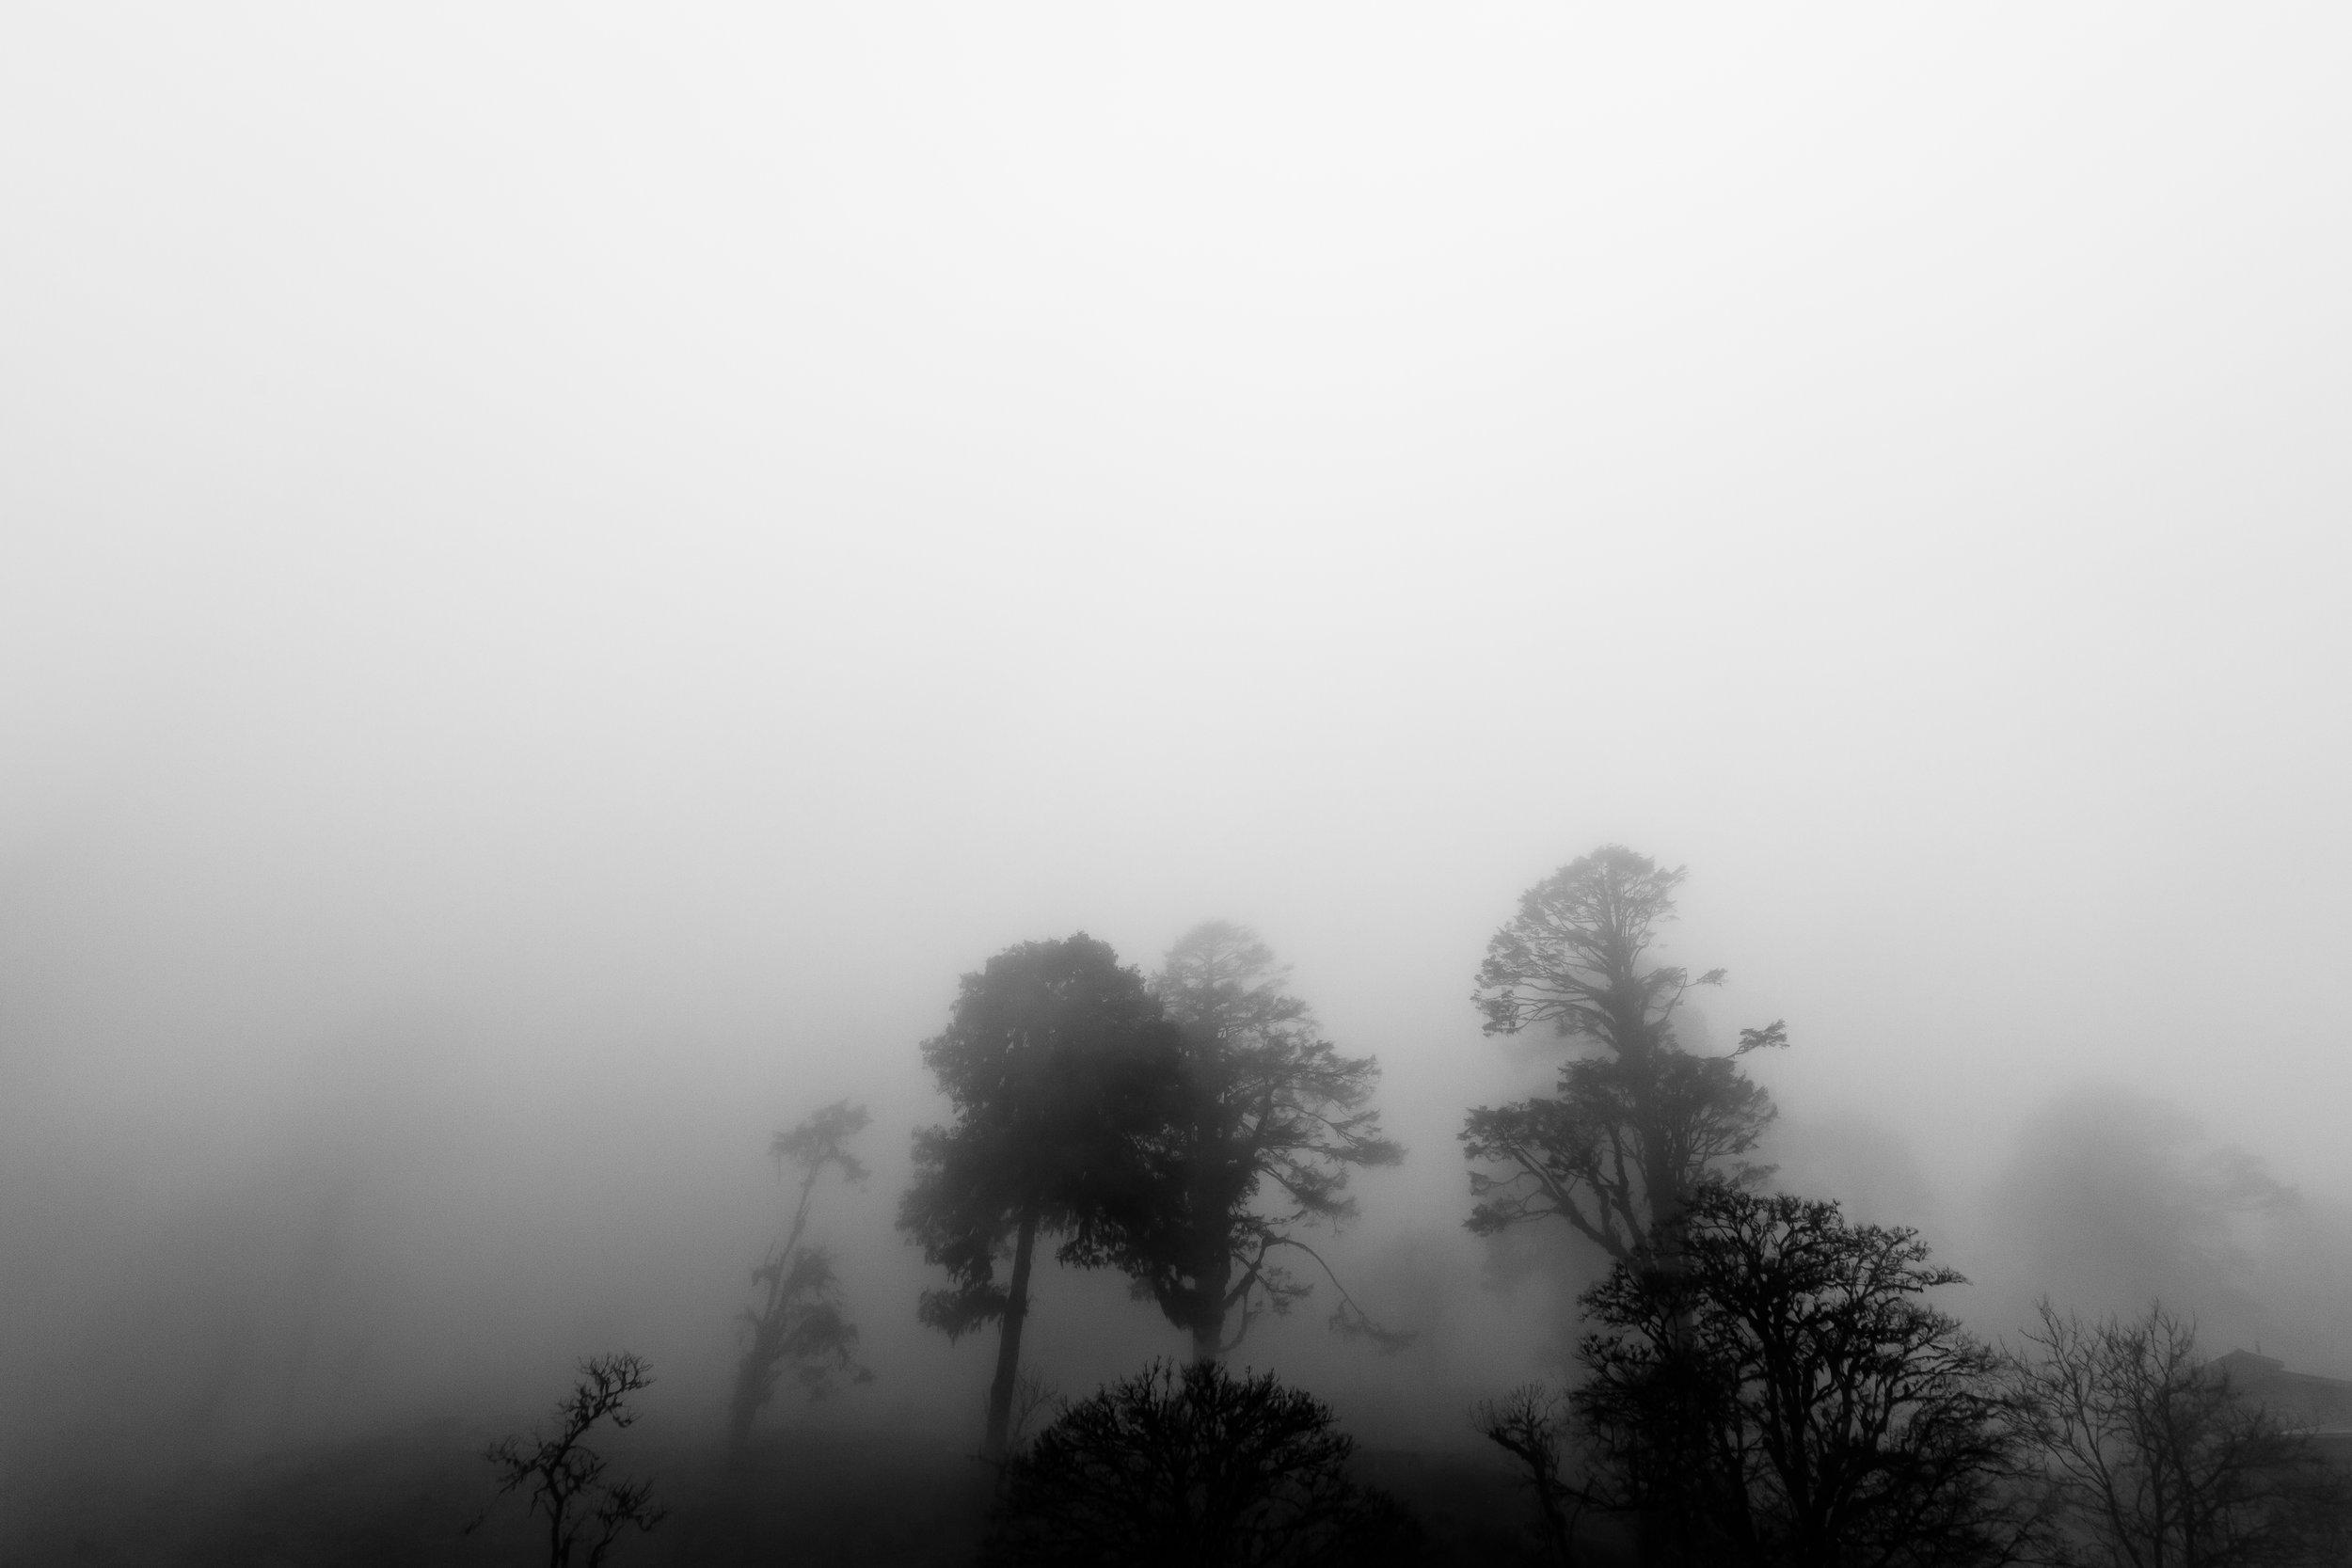 Bhutan-fog-trees.jpg